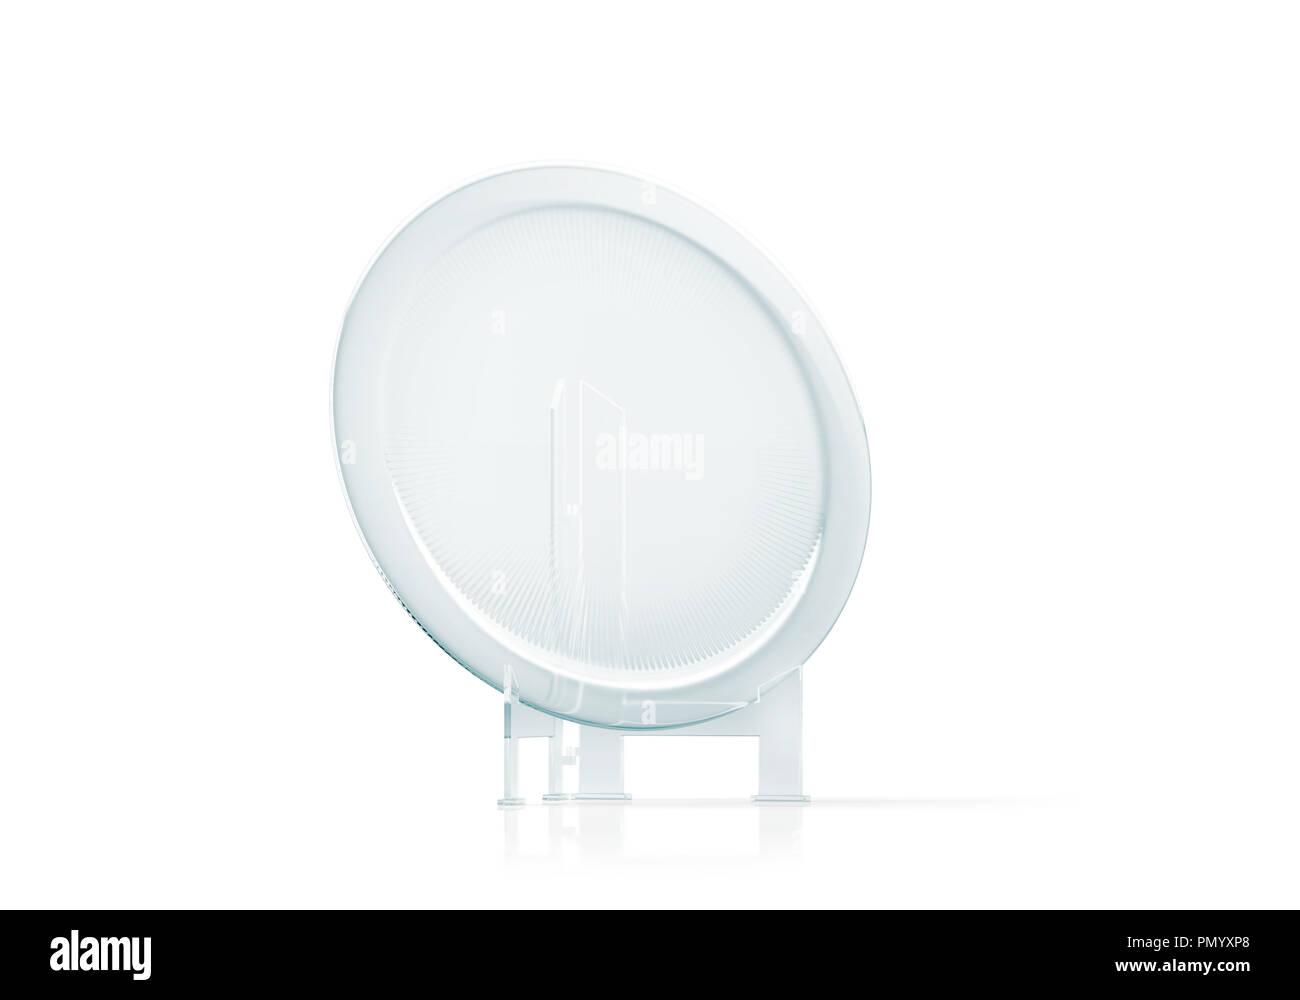 Blank round glass platter trophy mockup, 3d rendering  Empty acrylic